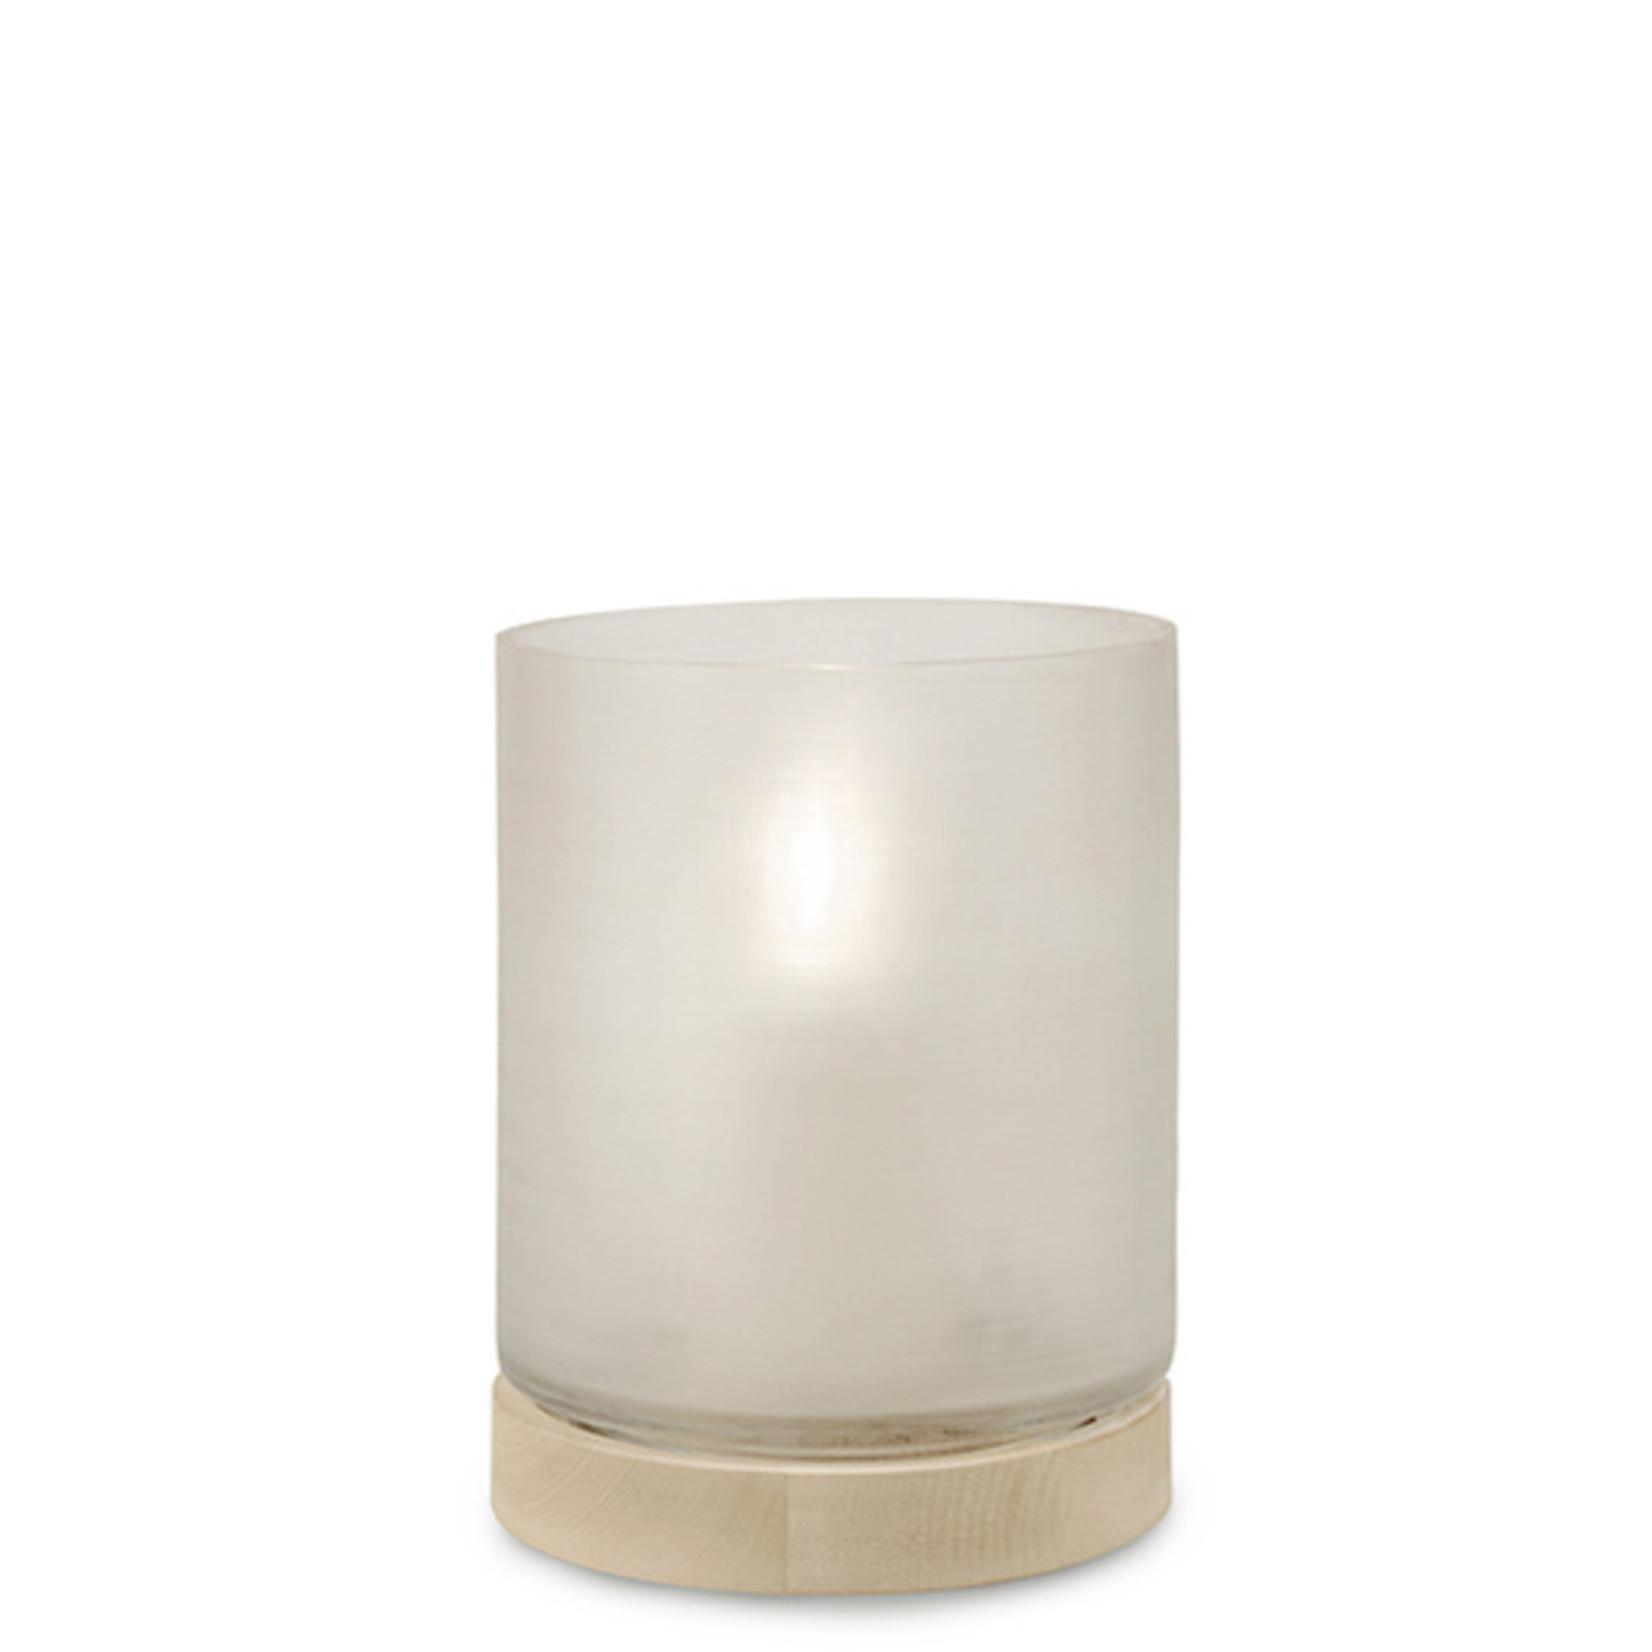 Guaxs Lantern Aran L | Clear / Sycamore